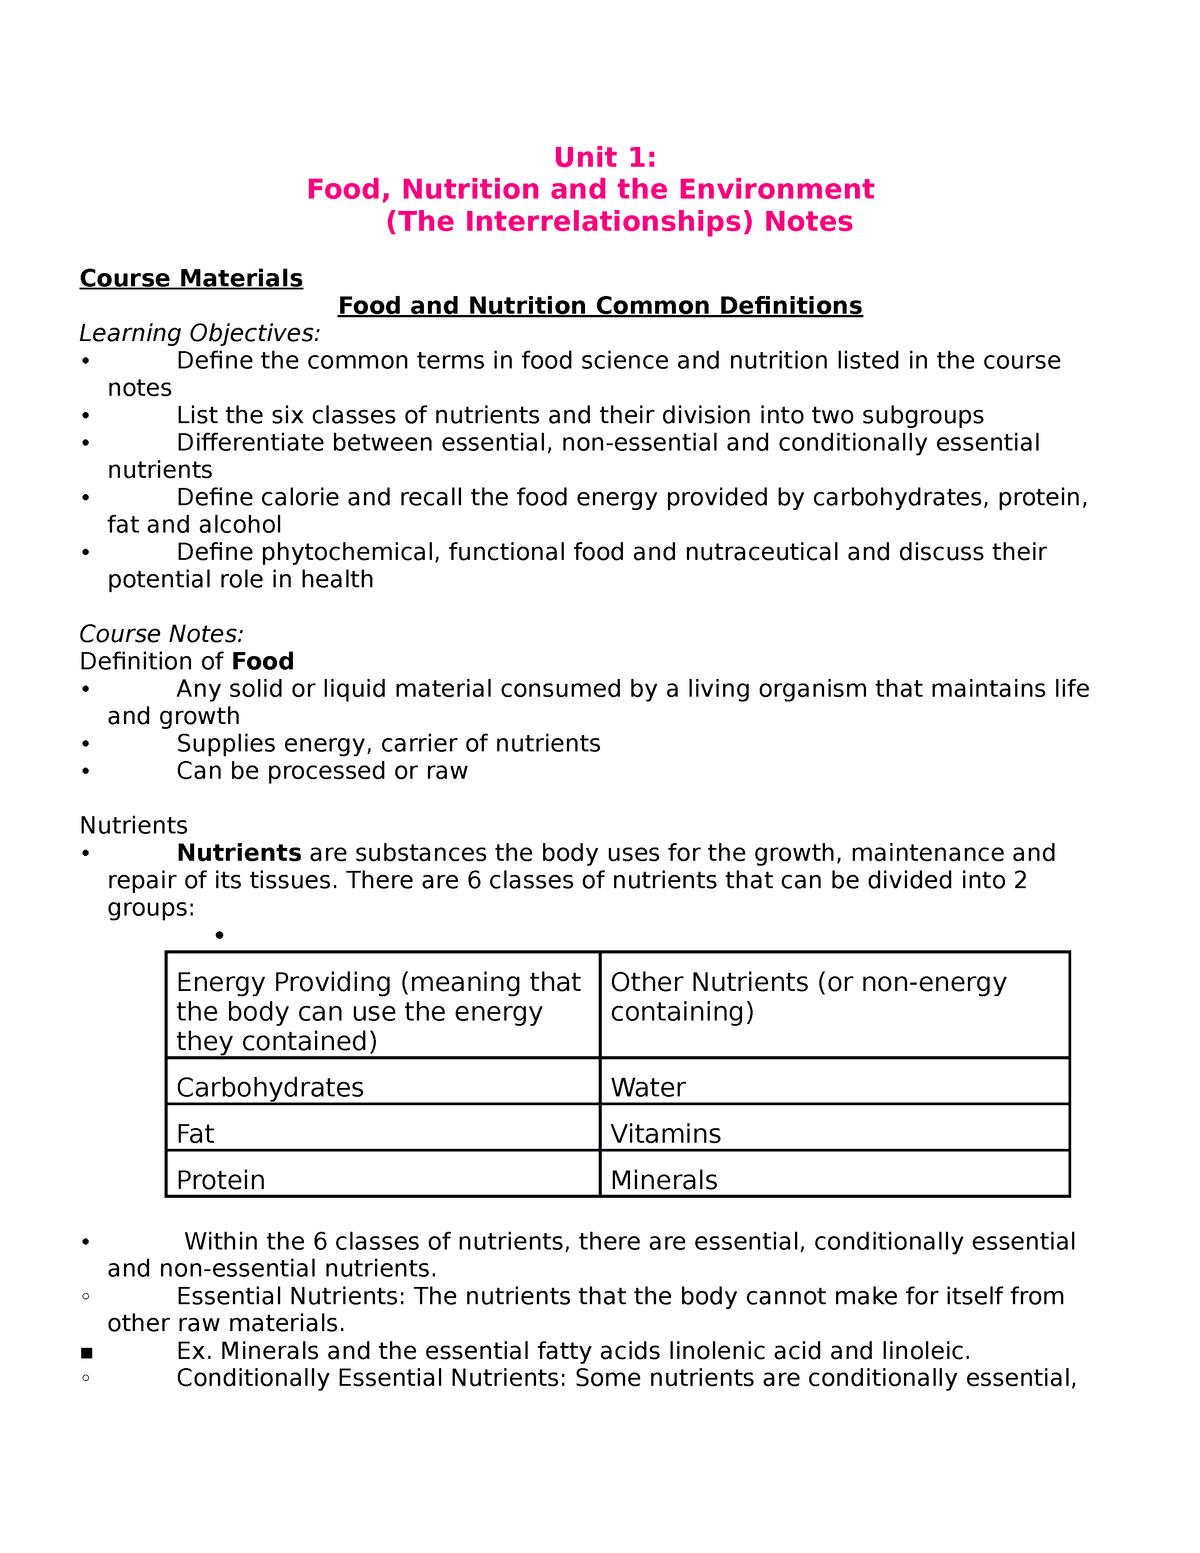 Lecture notes, lectures units 1-5 - HNSC 1200 - U of M - StuDocu